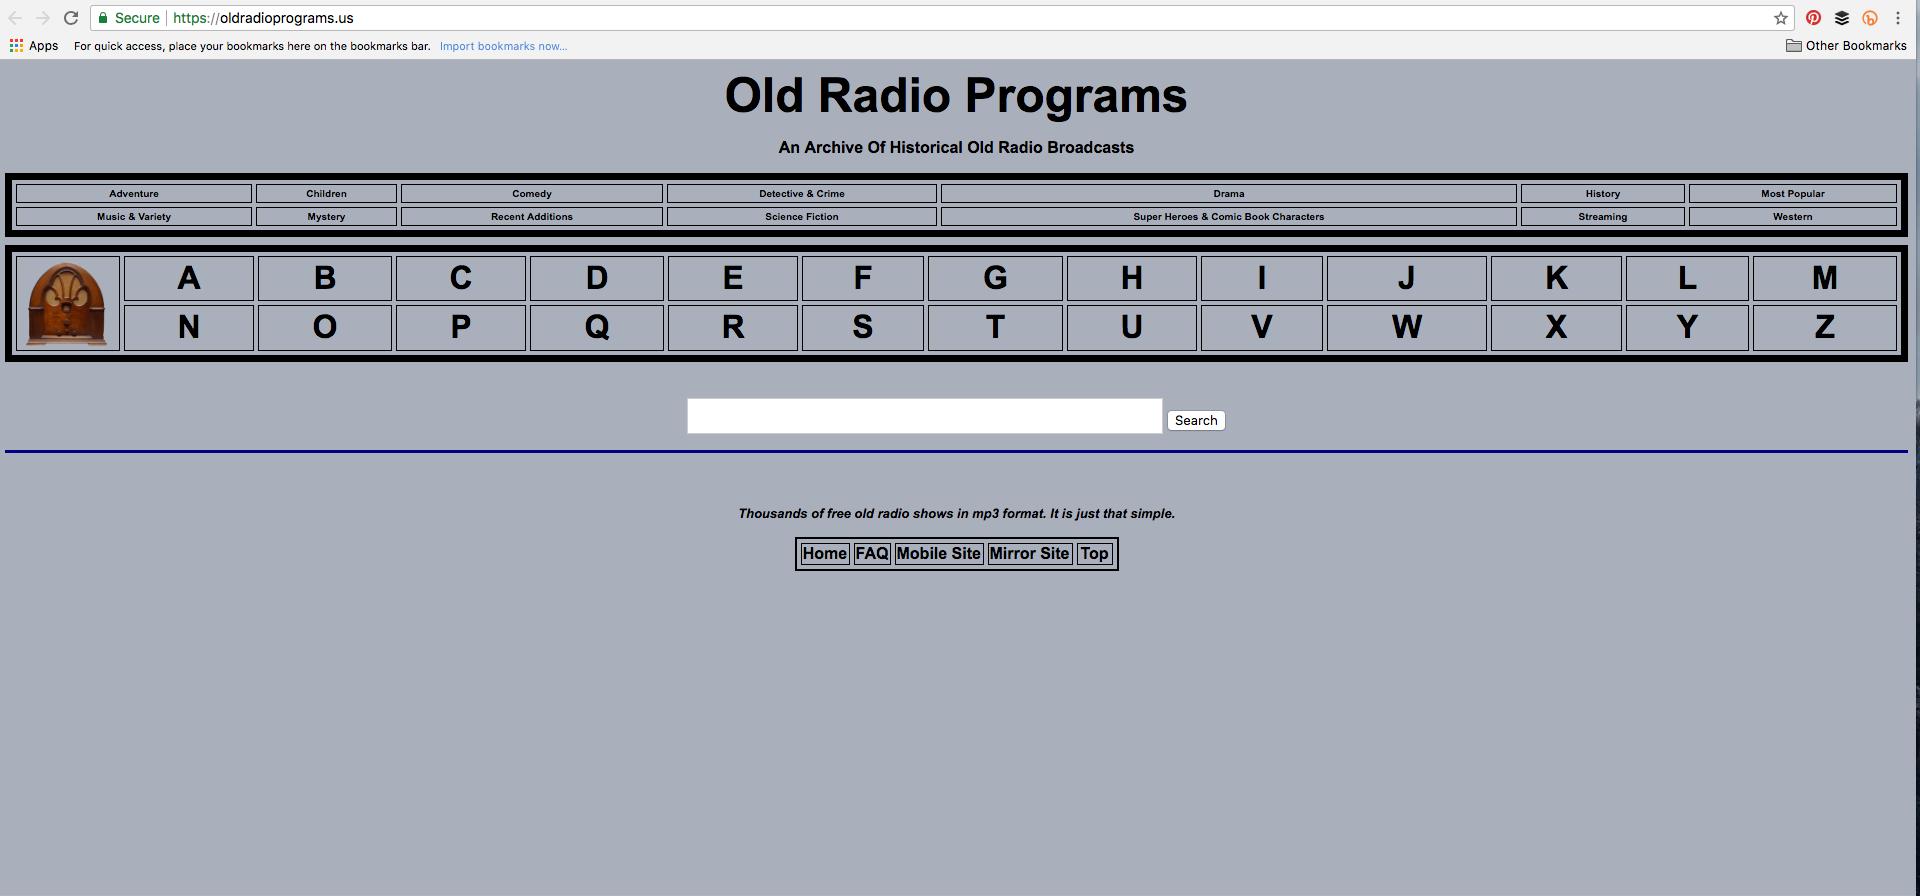 Old radio programs website image